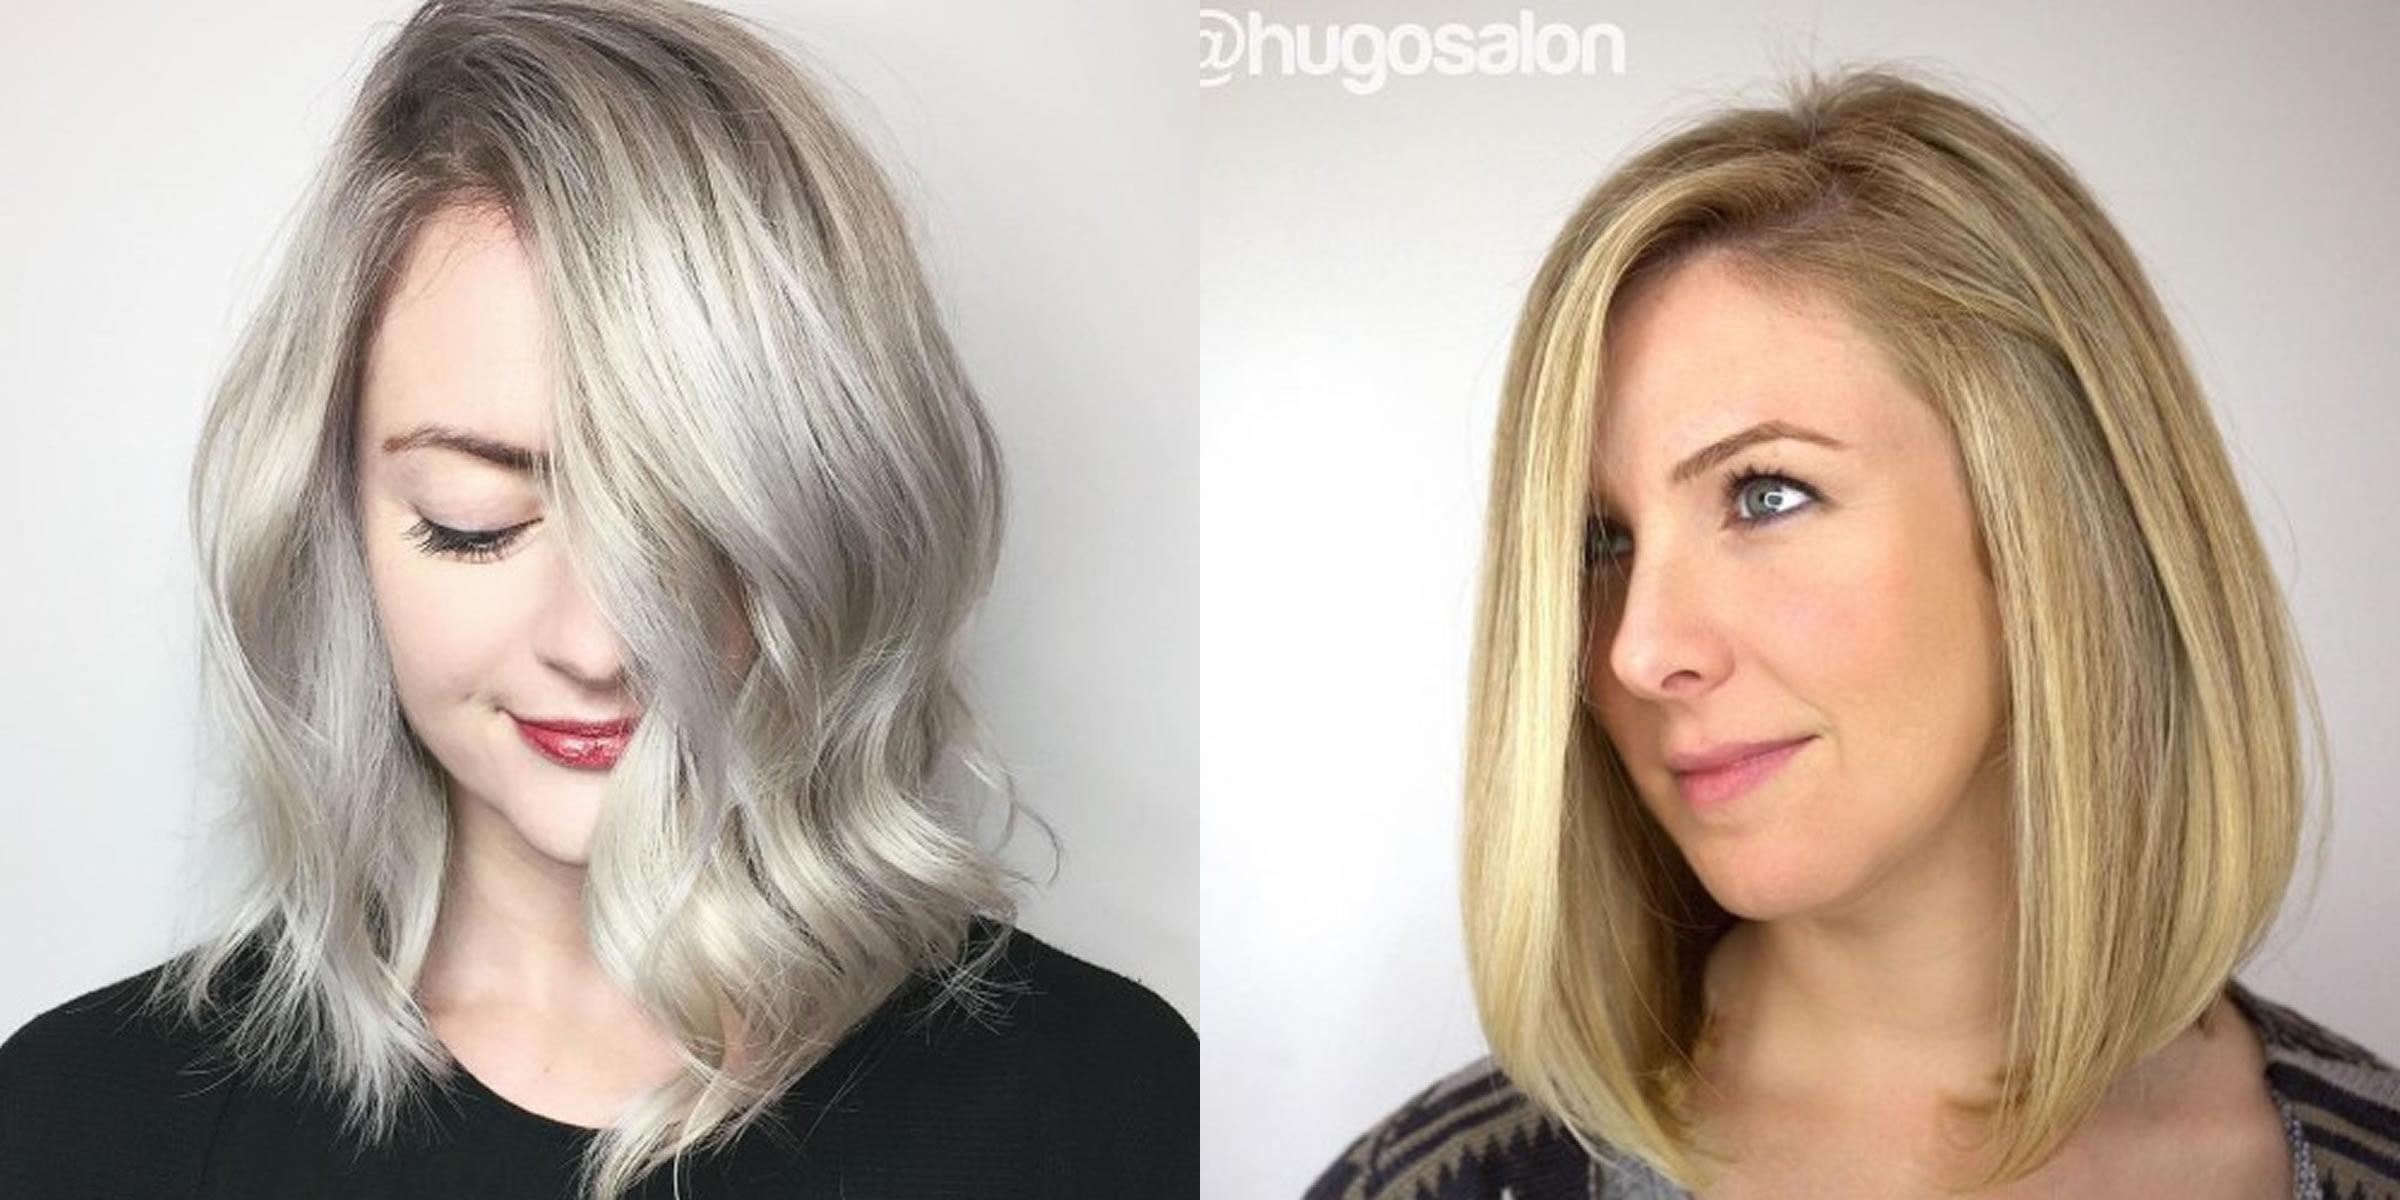 Long Bob Hairstyles 2019: Long Bob Hairstyles And Hair Colors